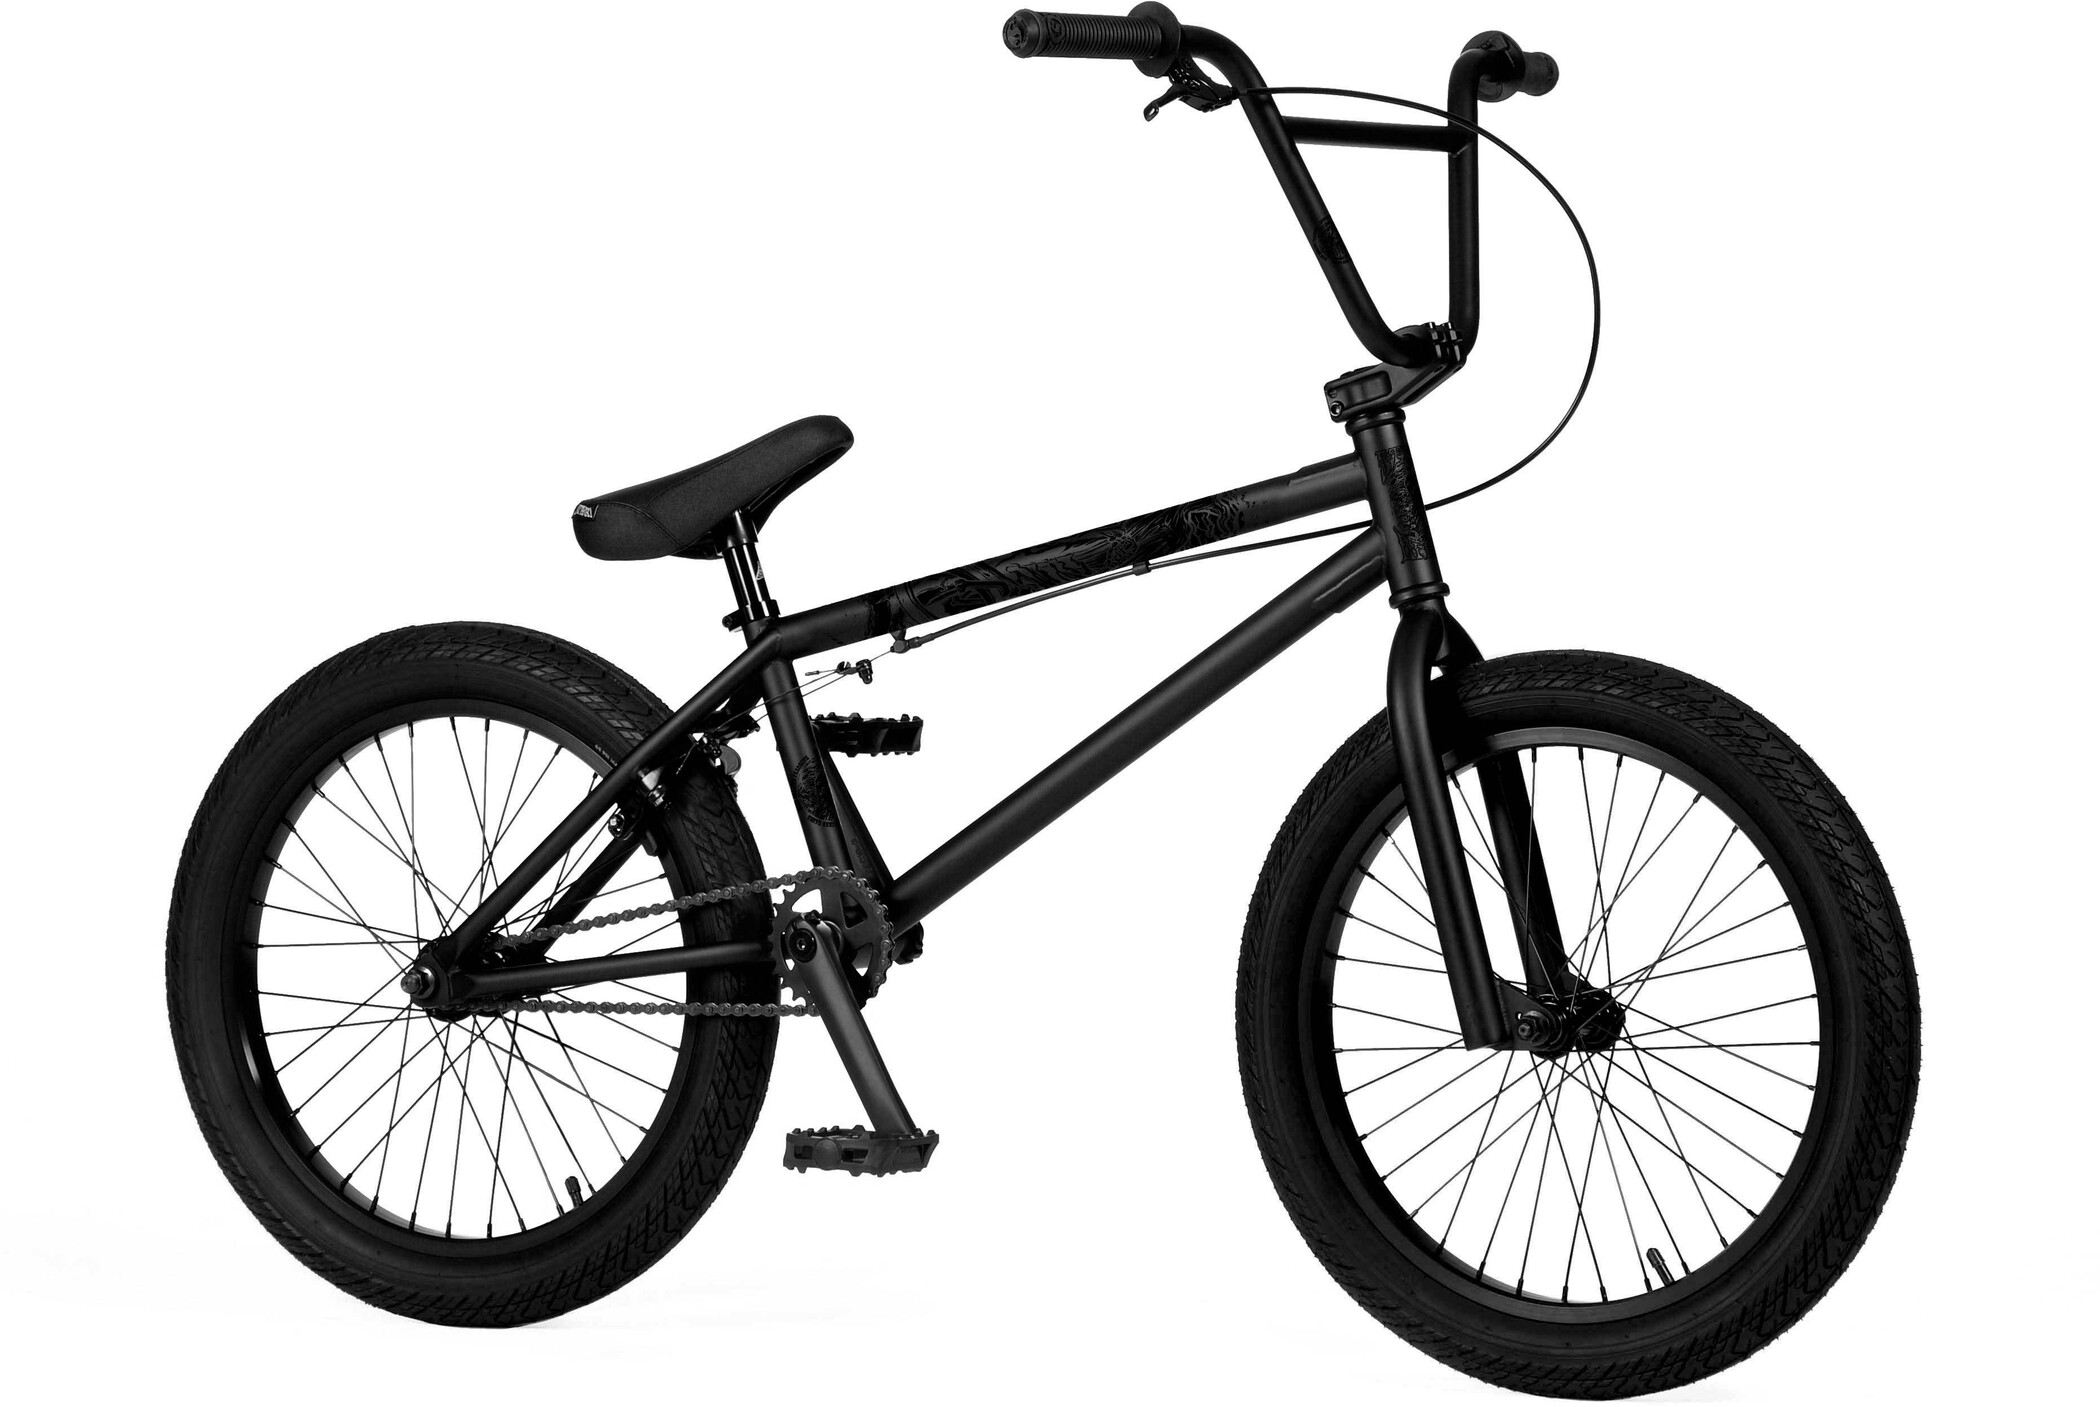 Stereo Bikes Woofer 20